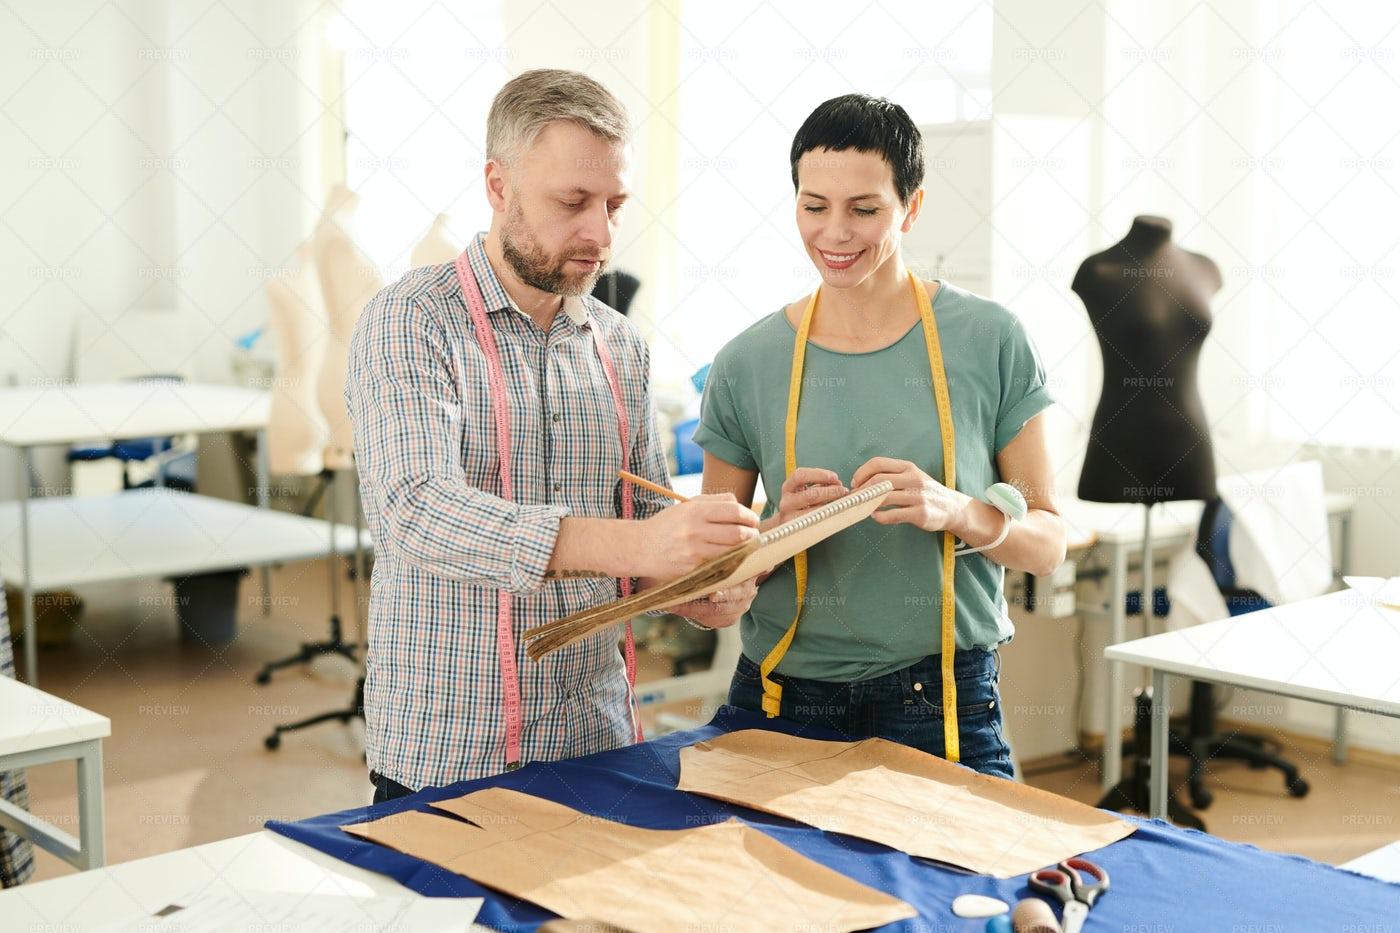 Colleagues In Tailoring Shop: Stock Photos